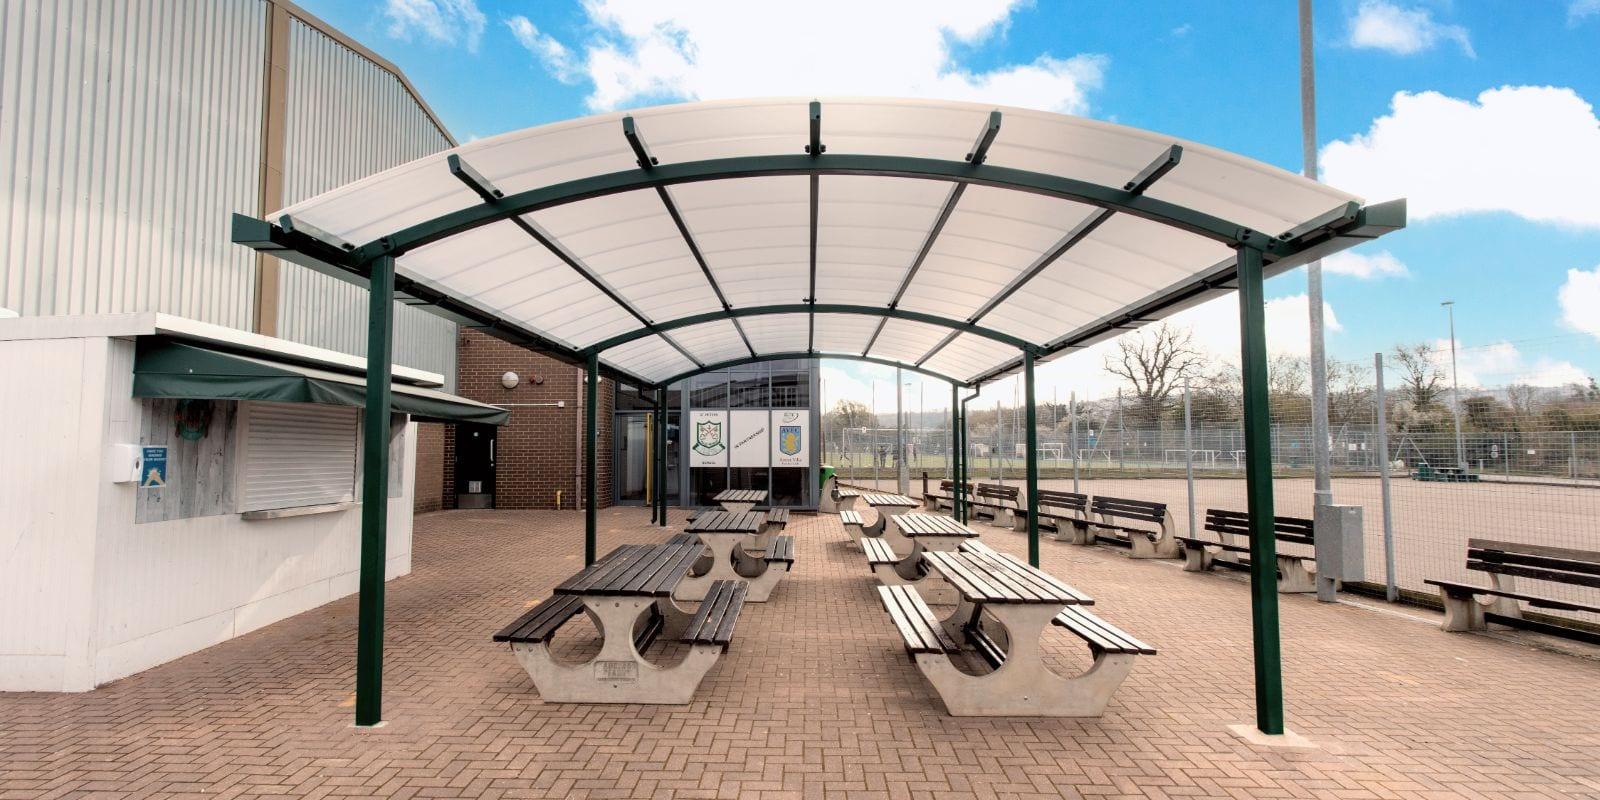 Freestanding shelter we designed for St Peter's High School